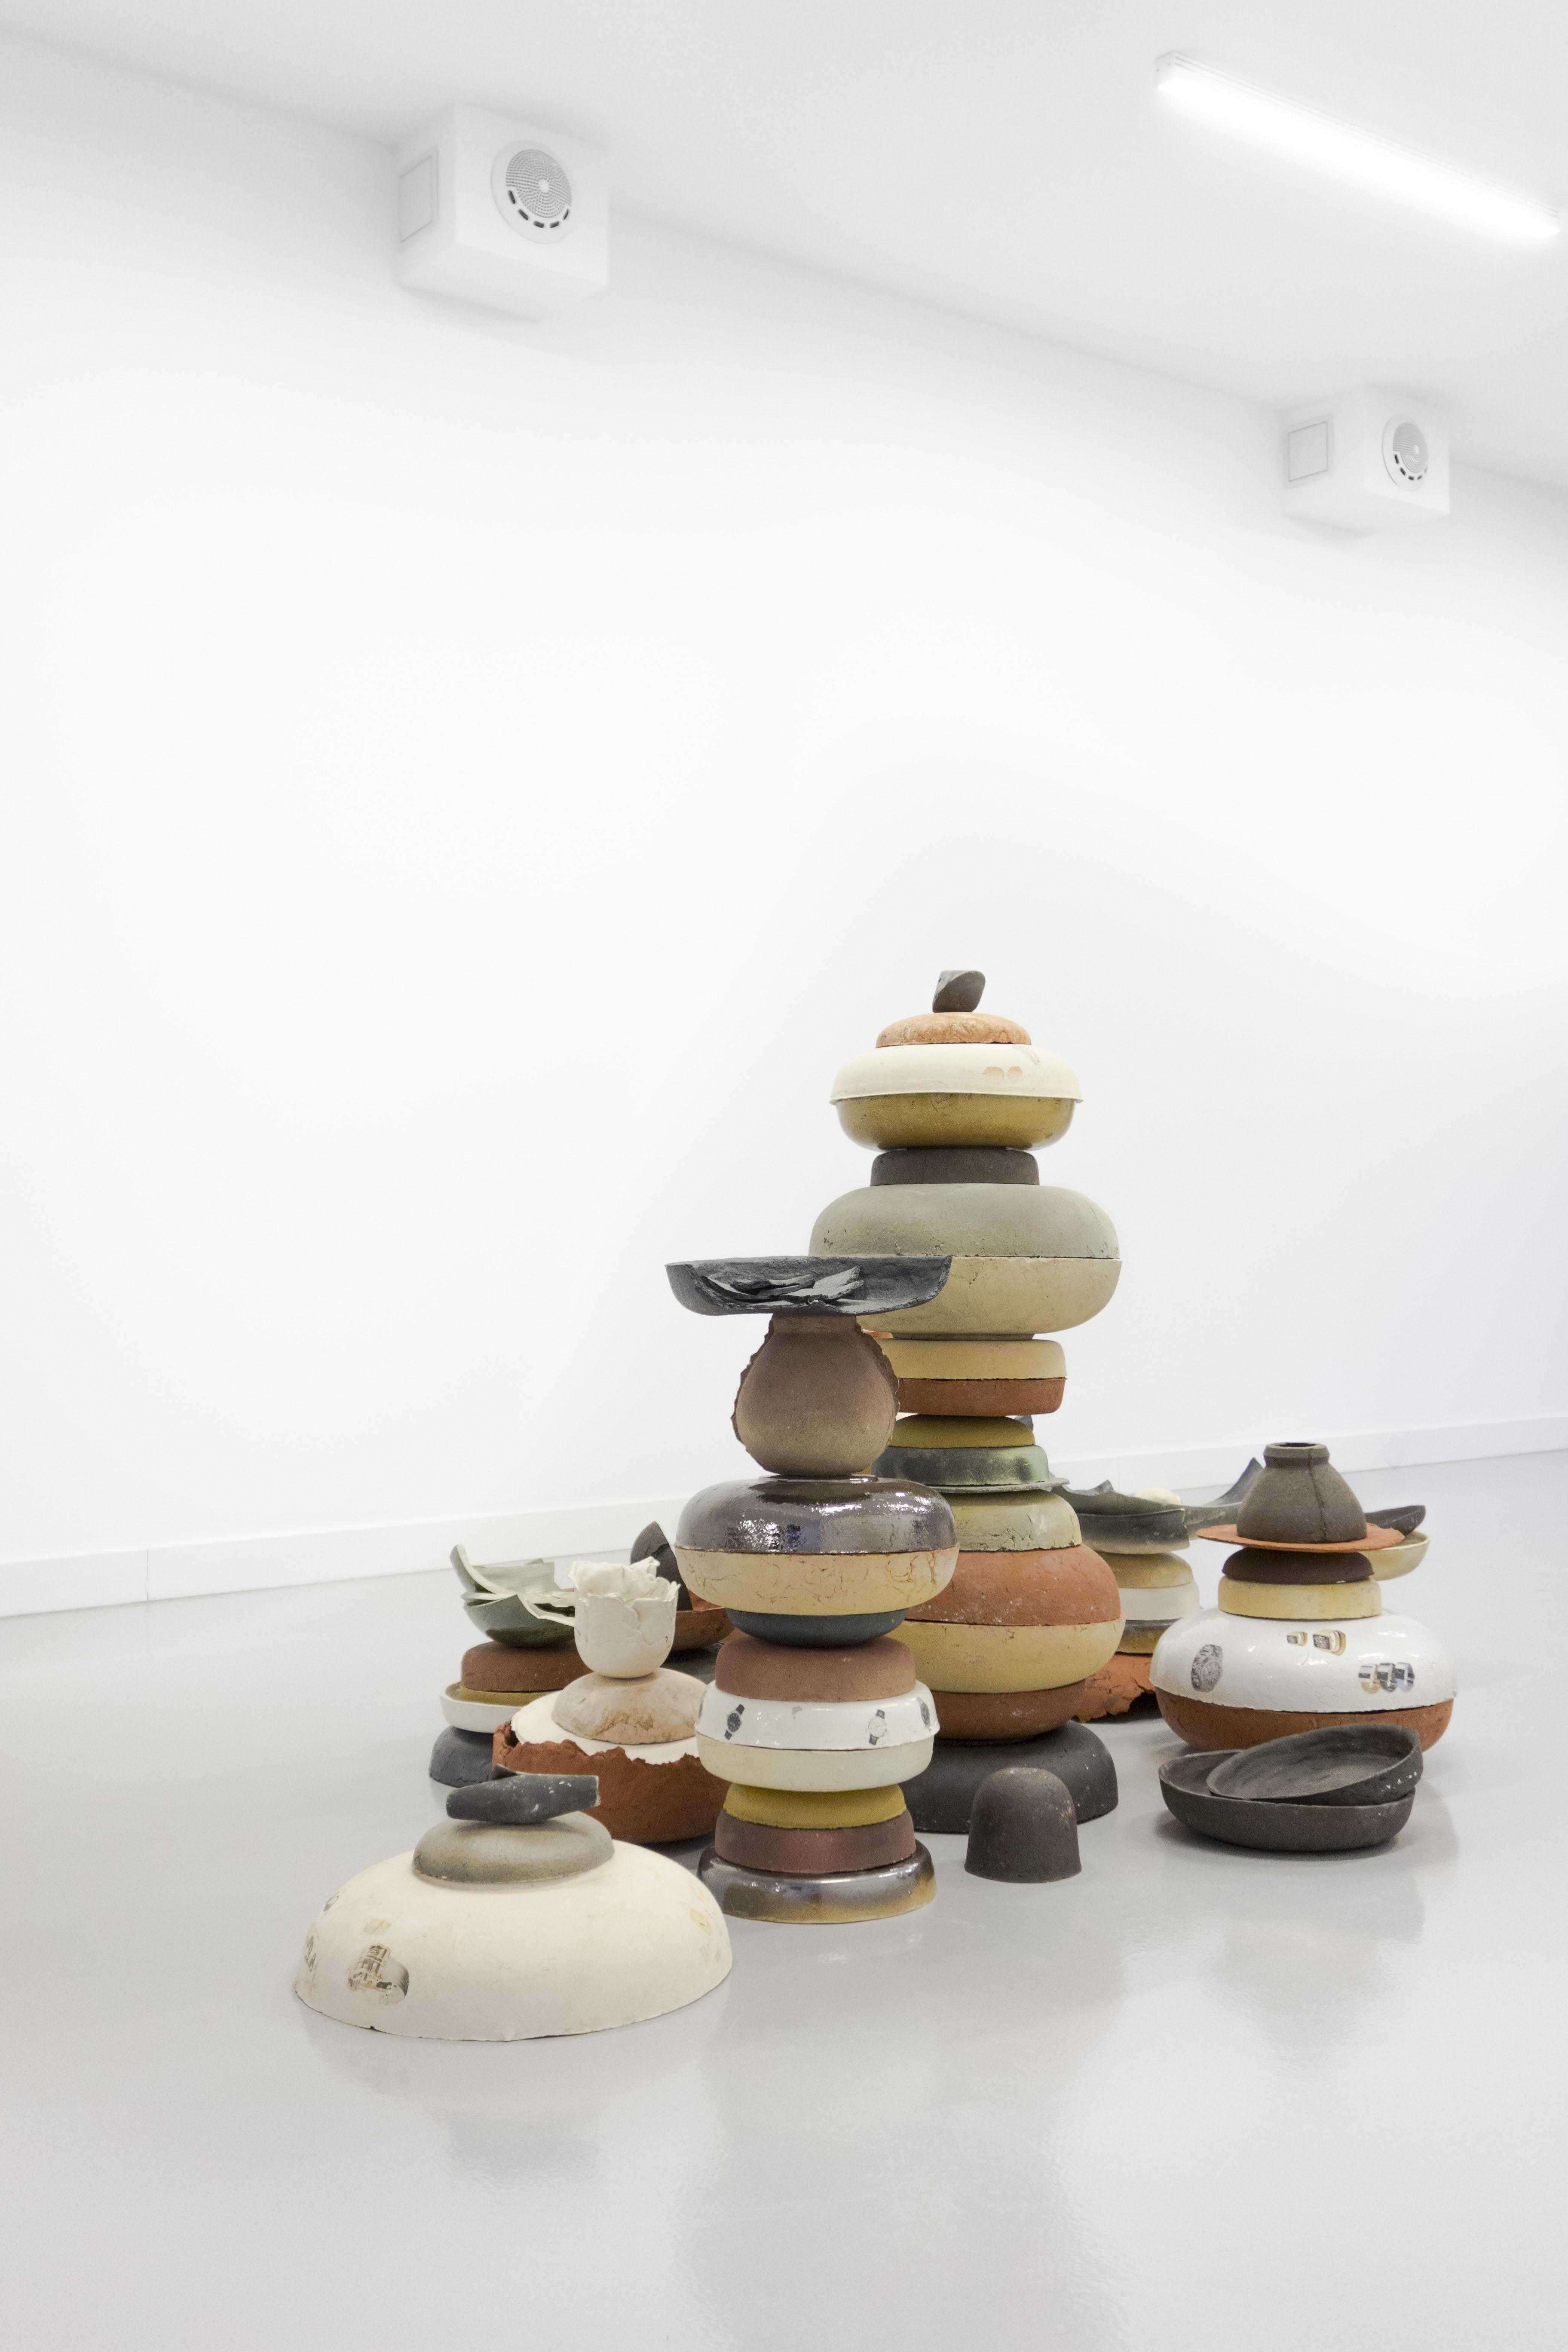 Thomas van Linge, Untitled (Bowls), 2014, wymiary zmienne